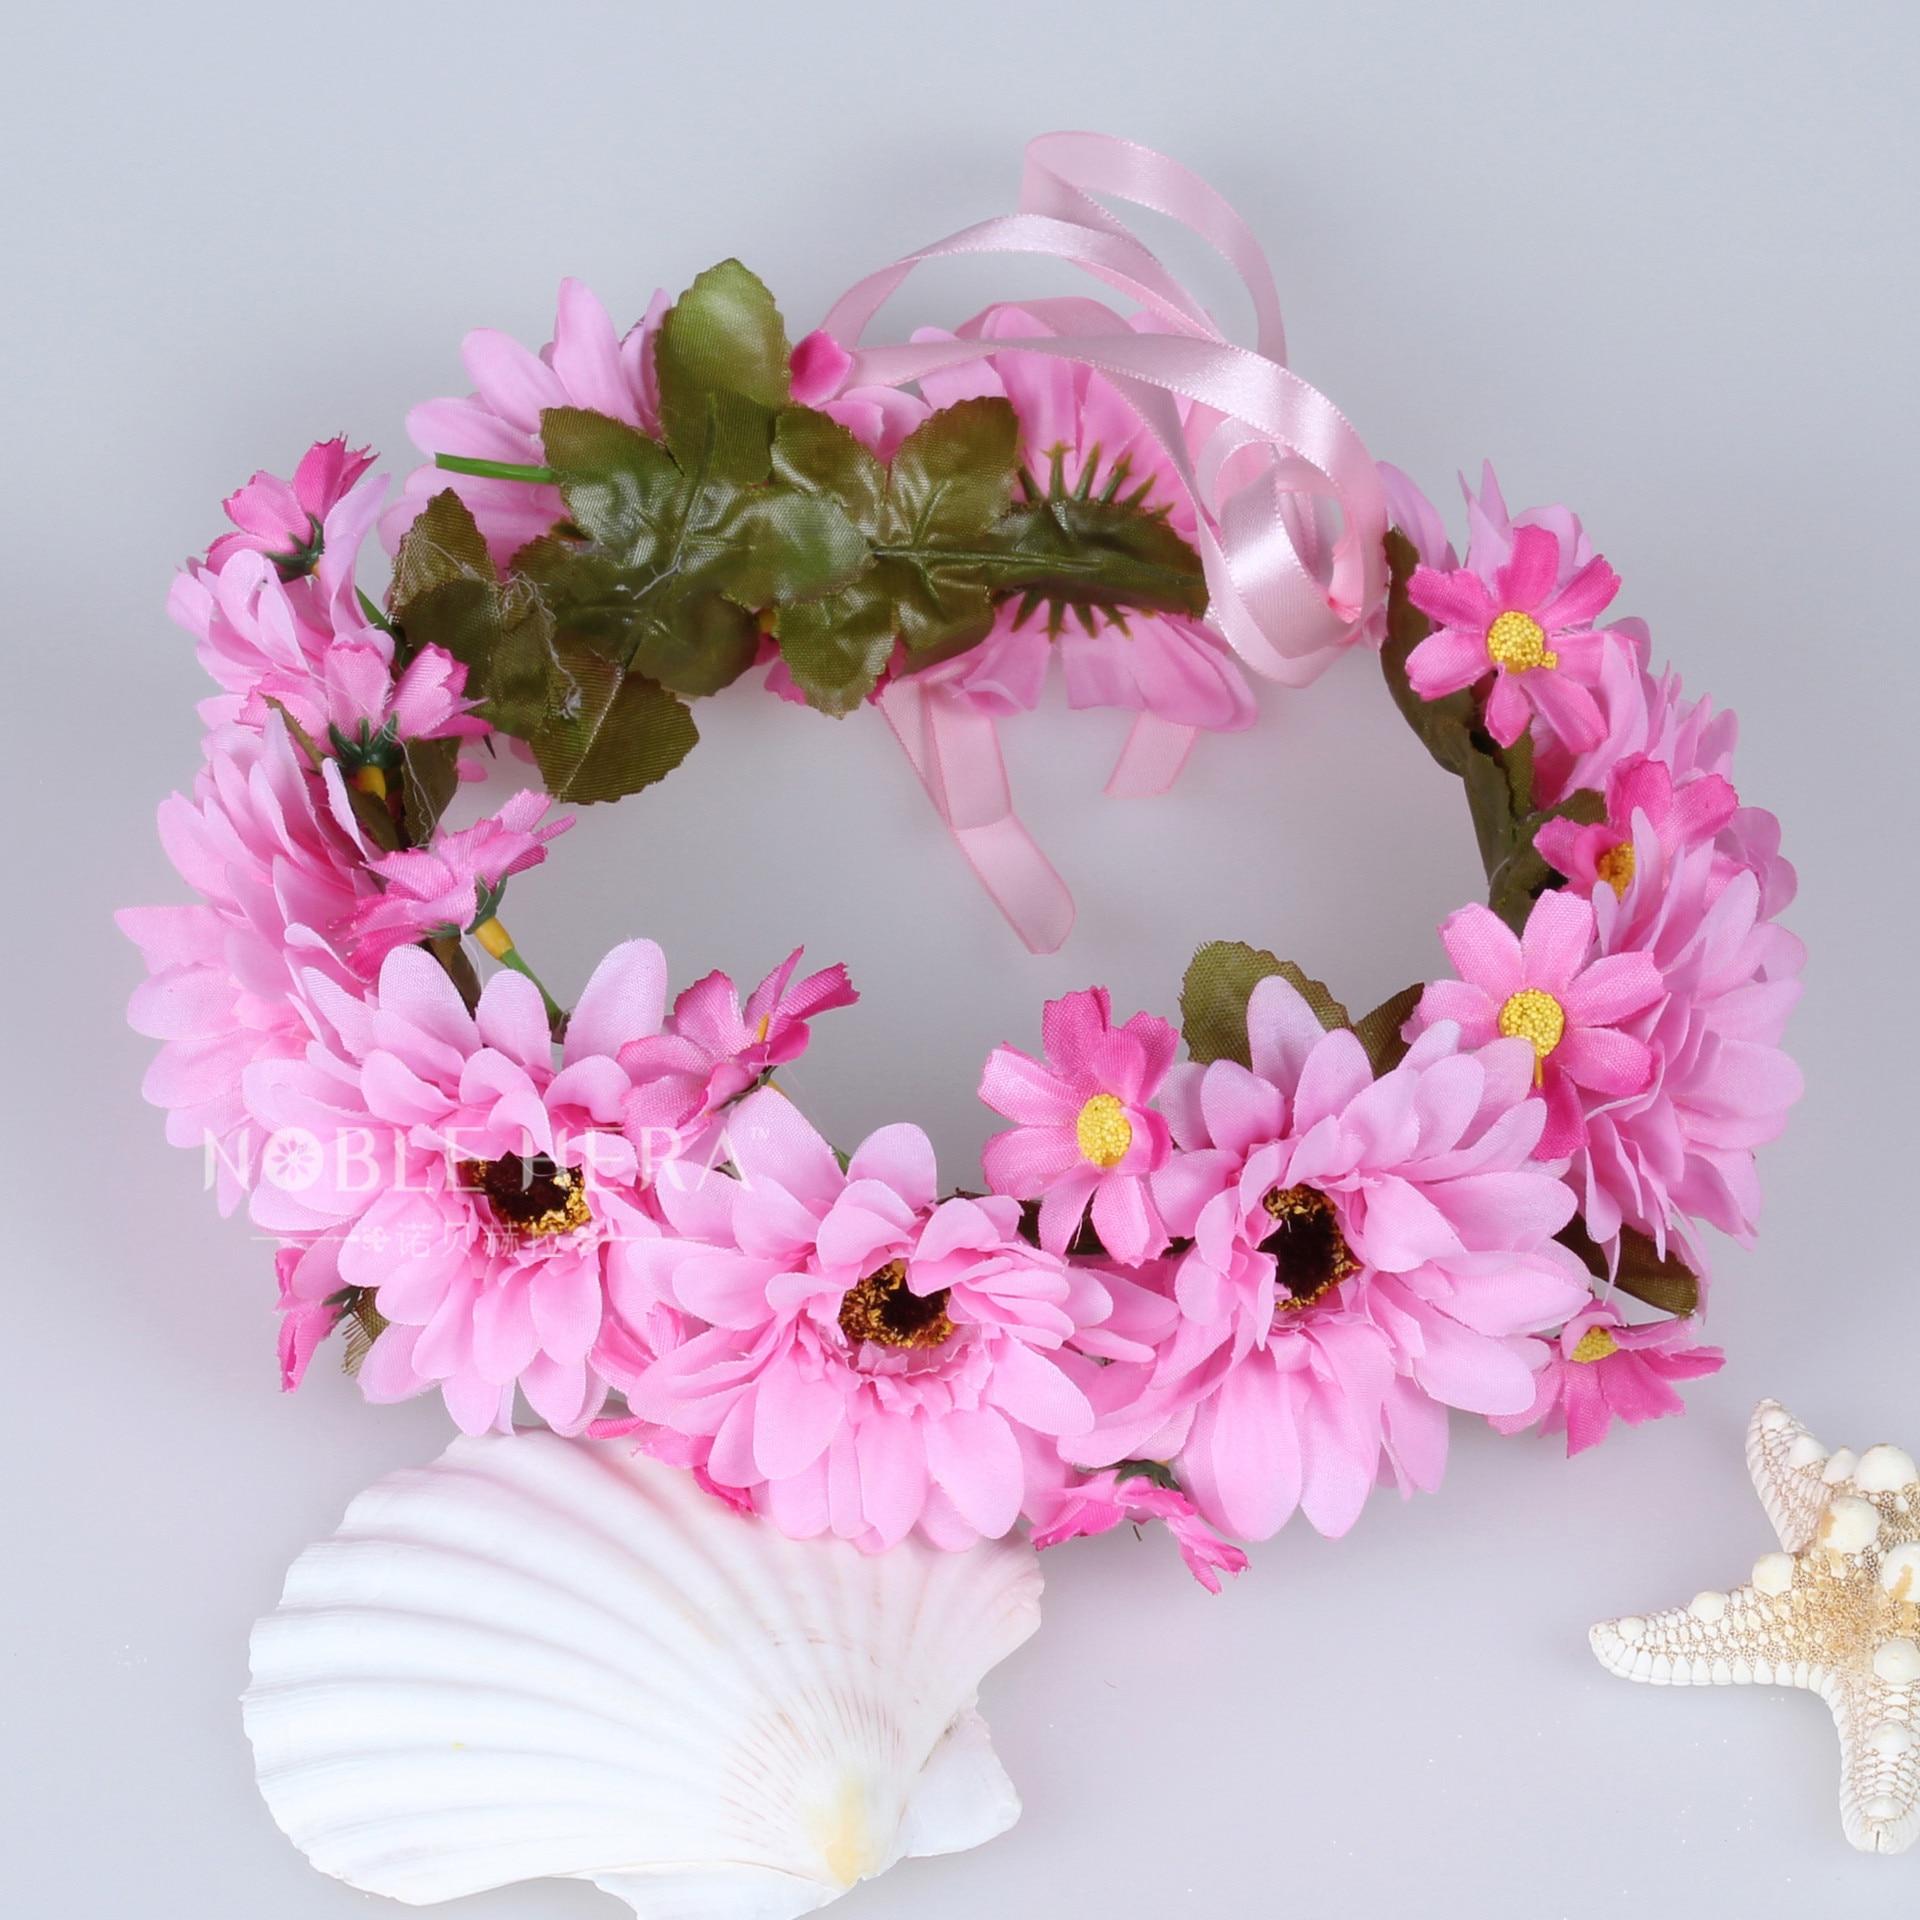 El Original Guirnalda de Flores Vestido de Novia para Adornos de ...